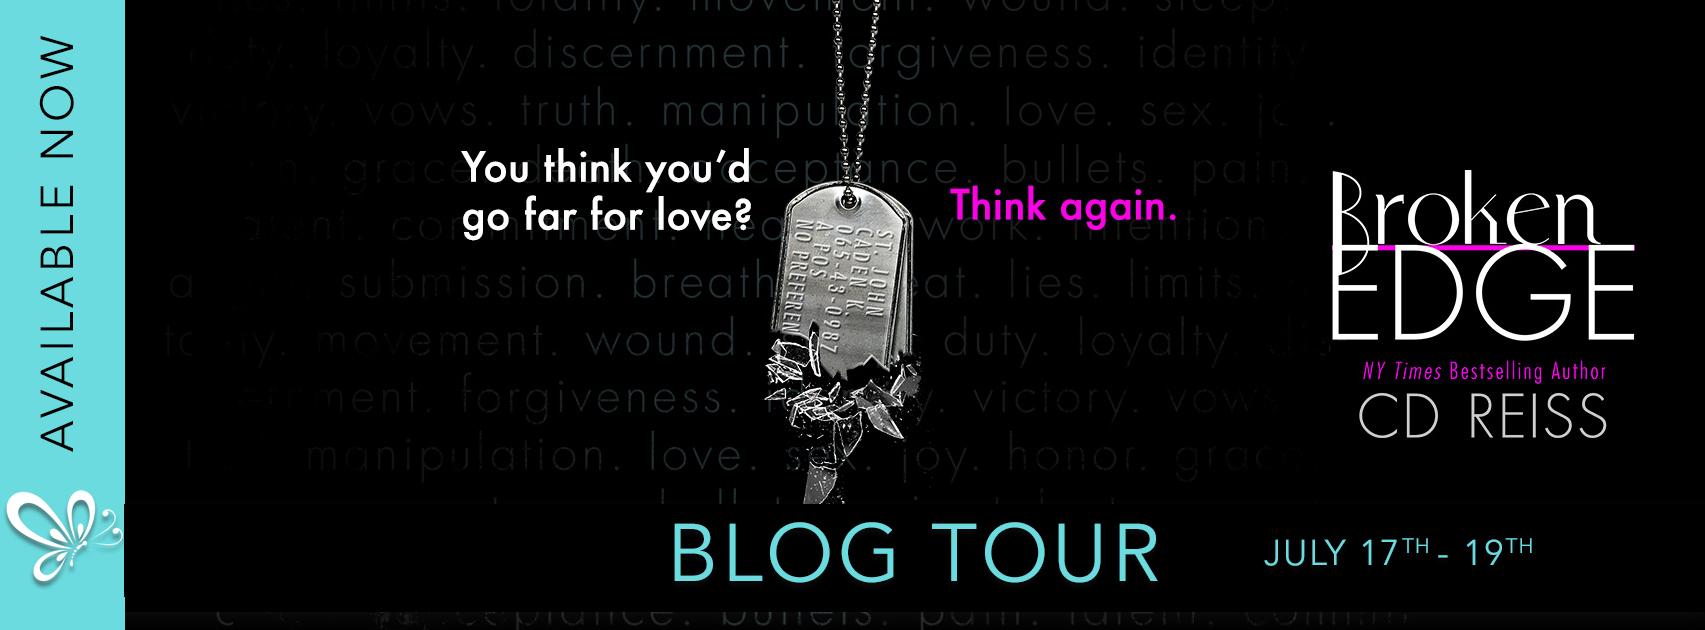 Blog Tour:  Broken Edge (The Edge Series #3) by CD Reiss